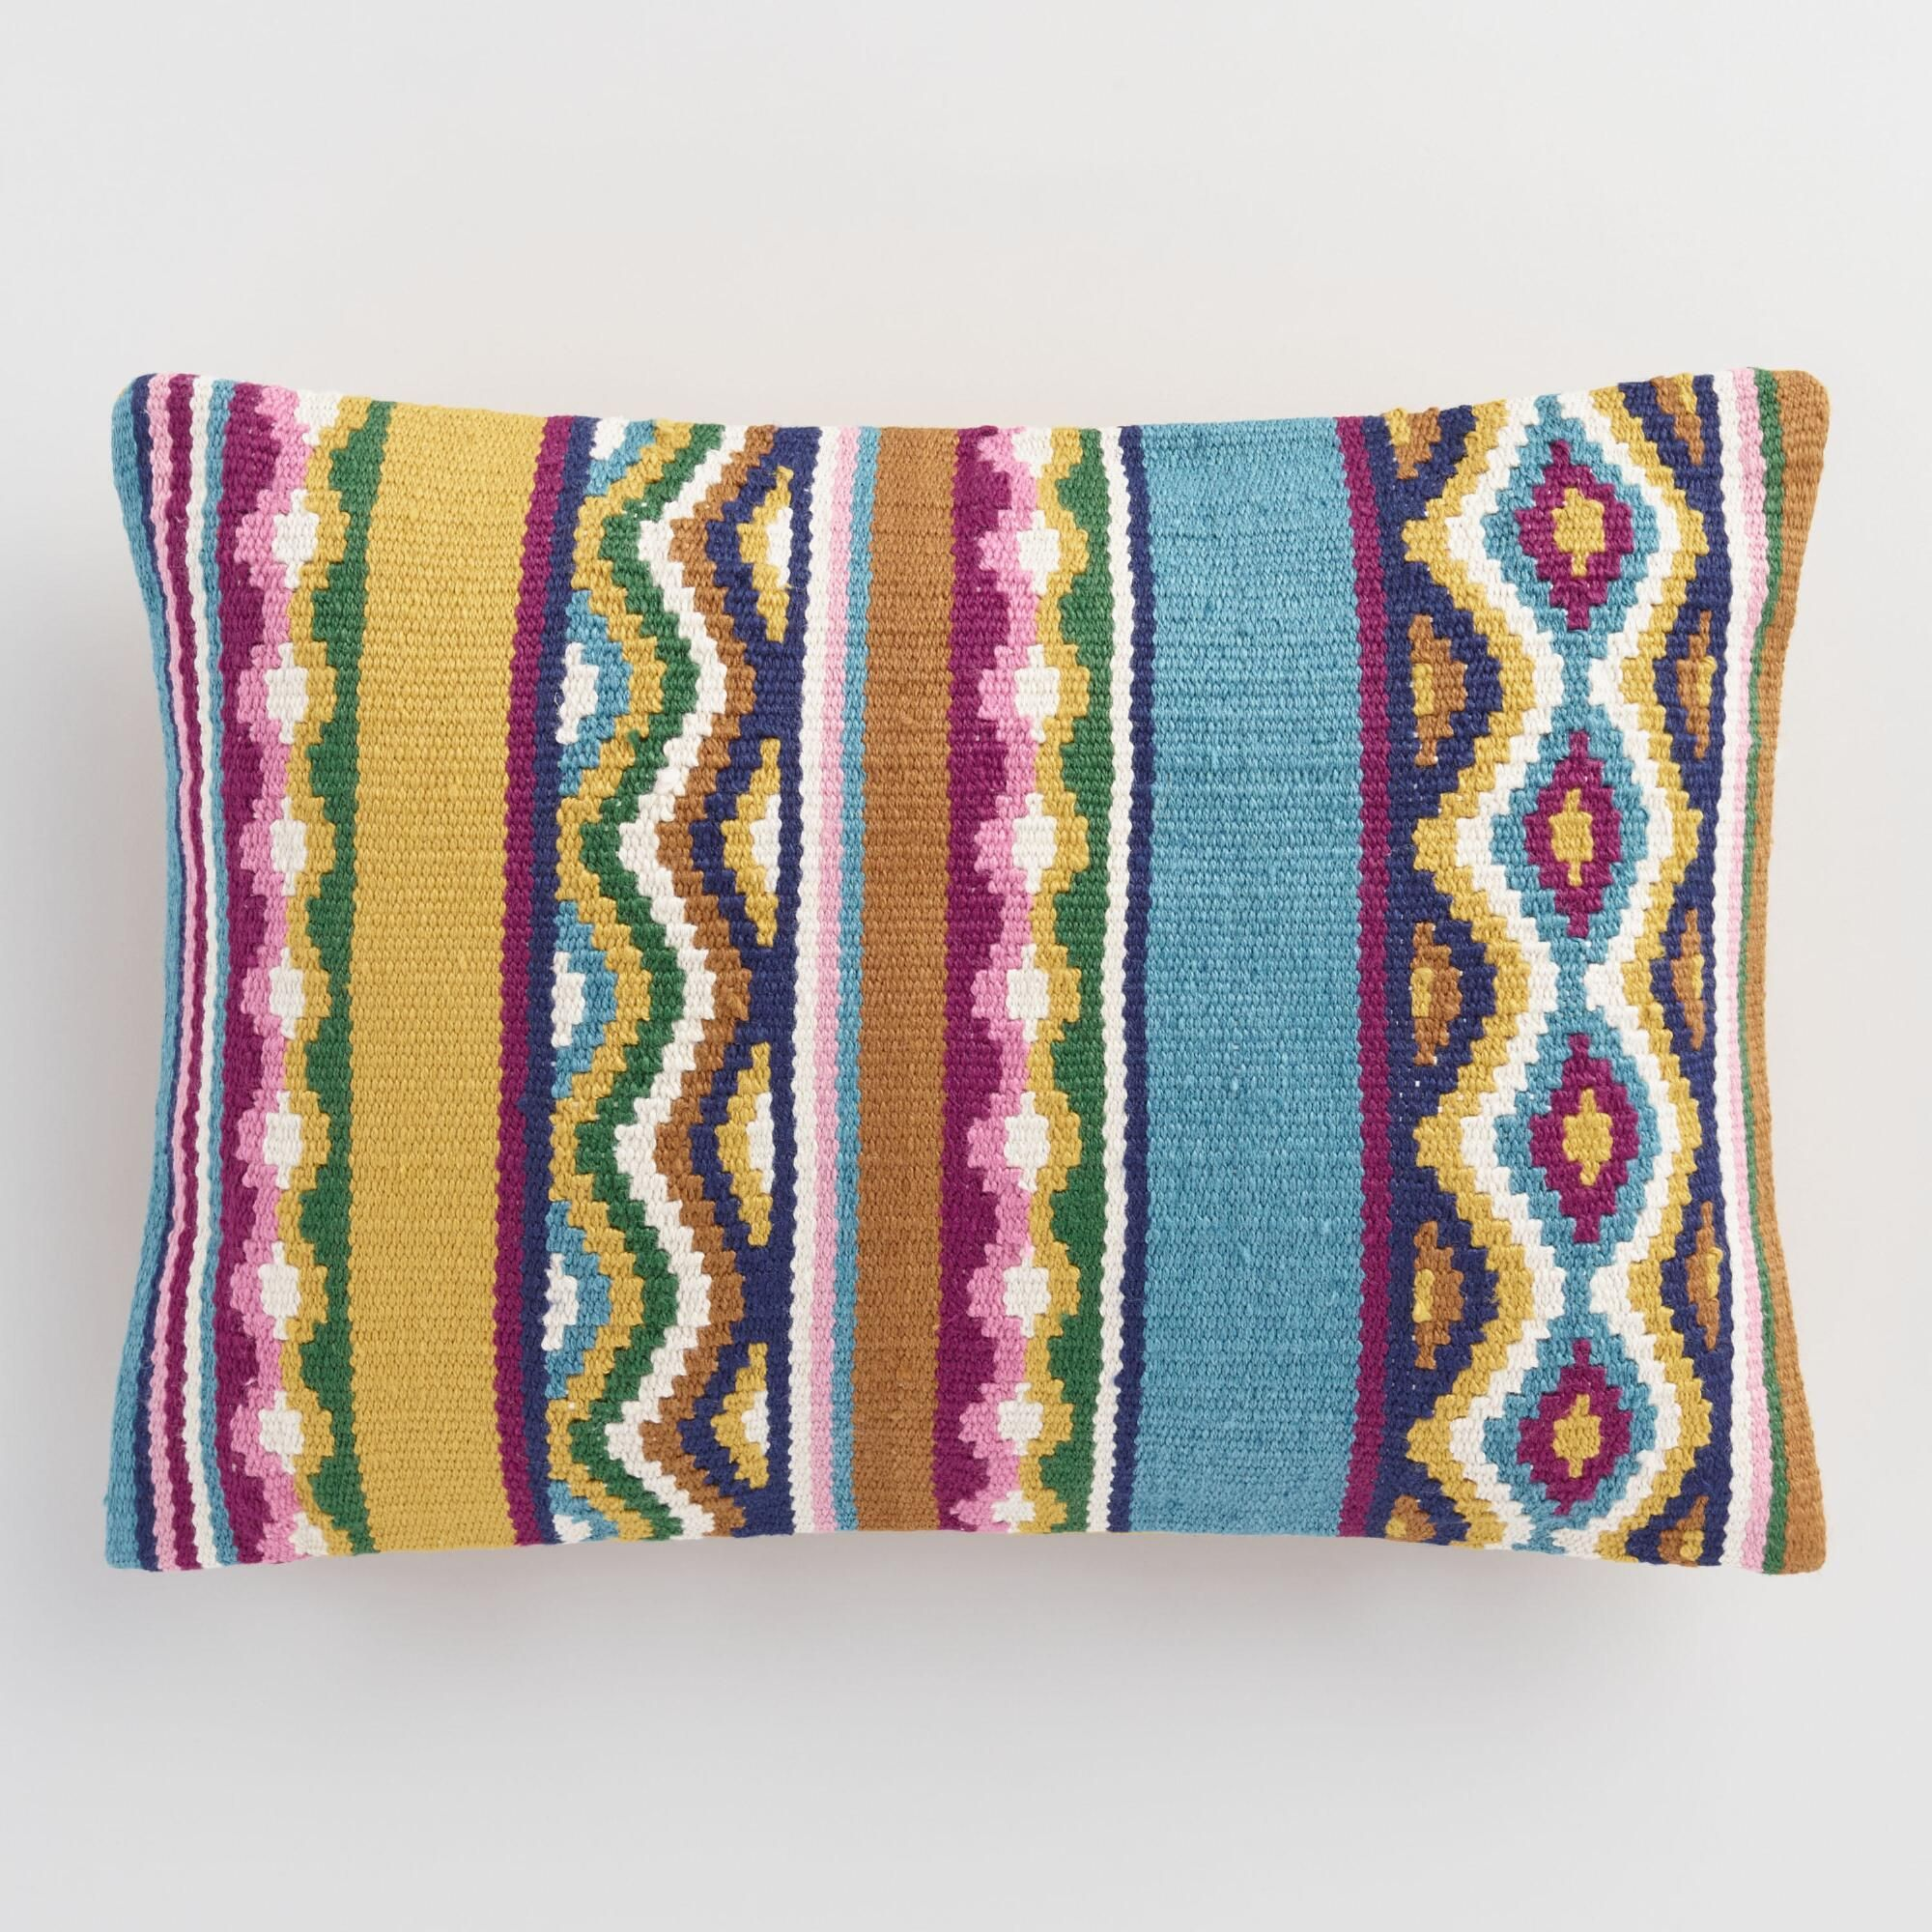 Multicolored Catalina Stripe Indoor Outdoor Patio Throw Pillow